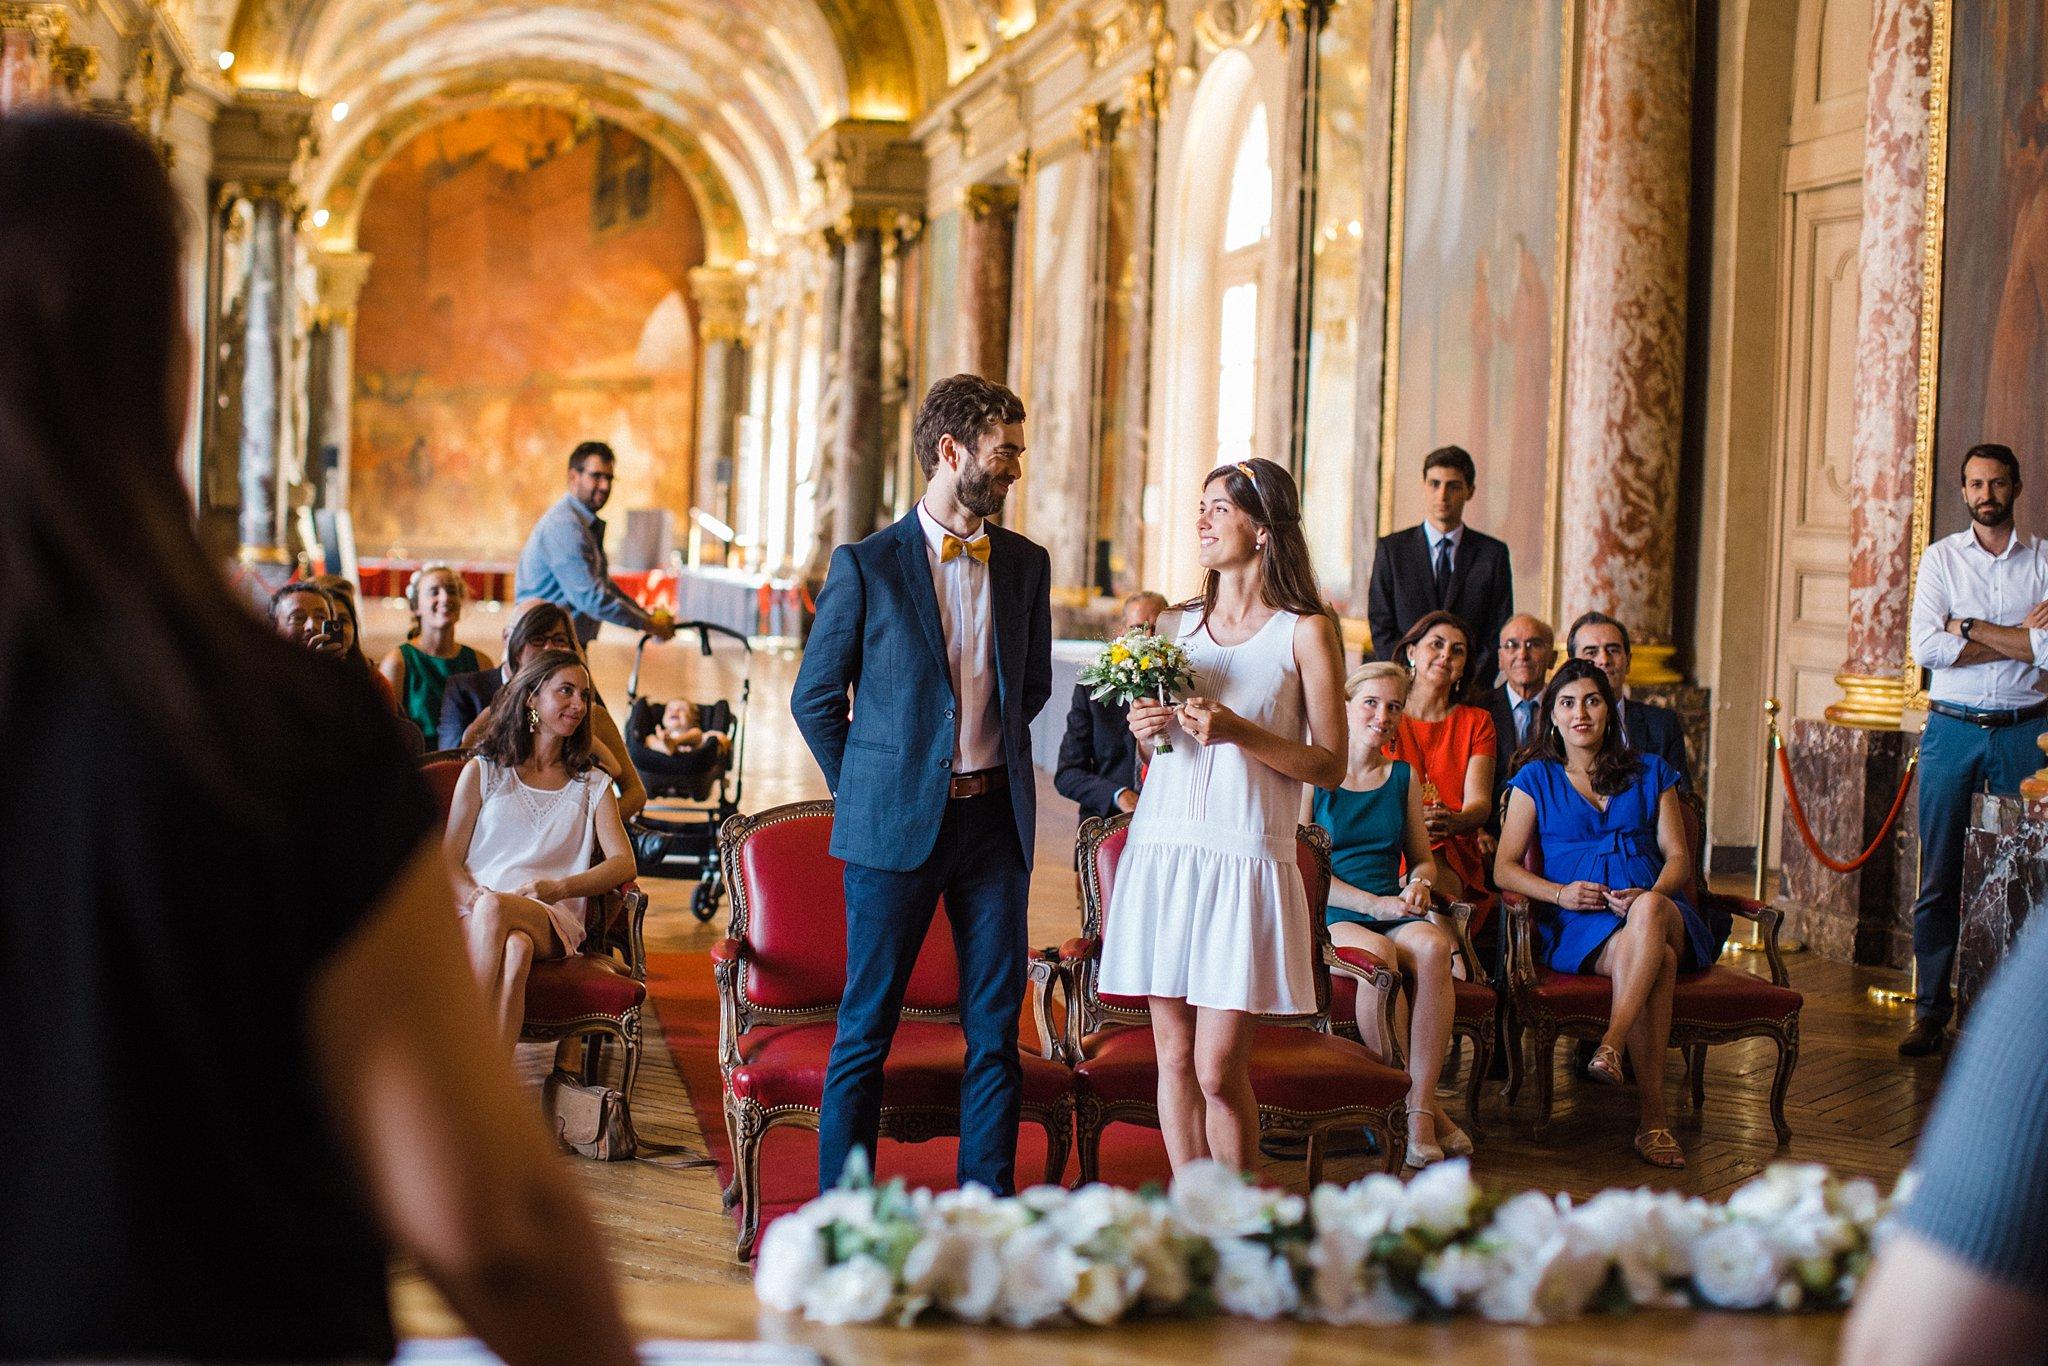 Mariage-a-la-maison-secall-hugo-hennequin-photographe-mariage-perpignan_0076.jpg